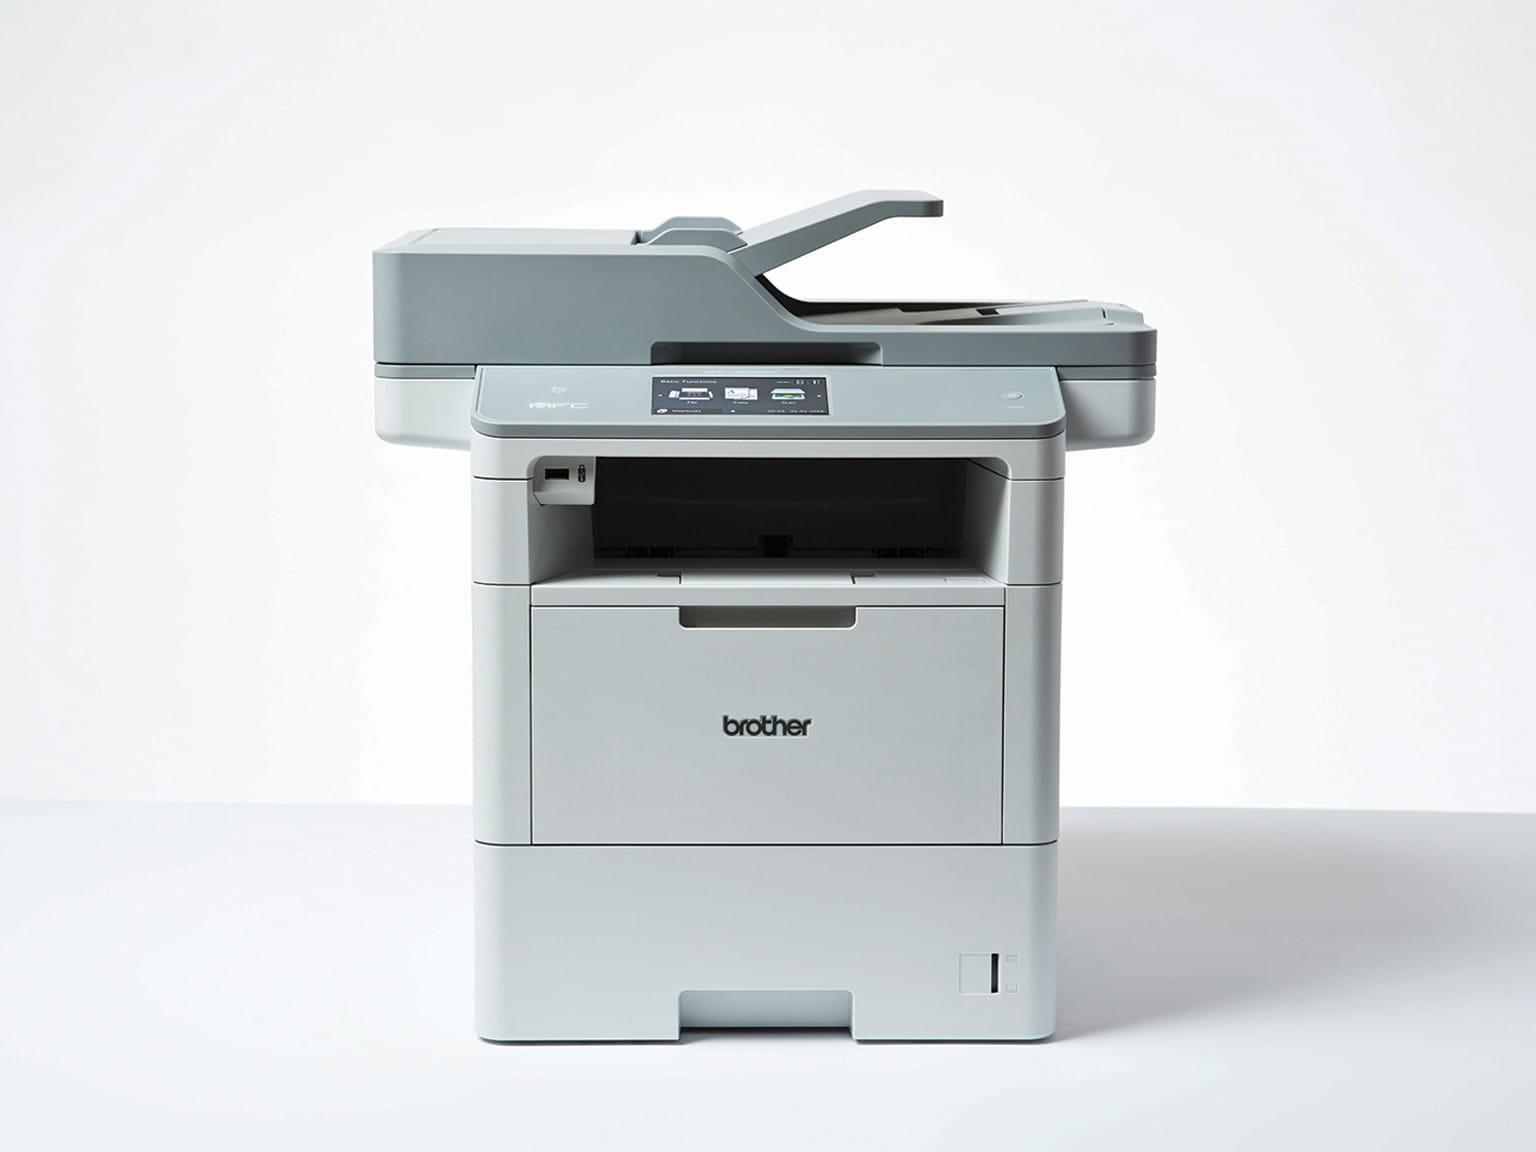 Brother-MFC-L6900DW-printer